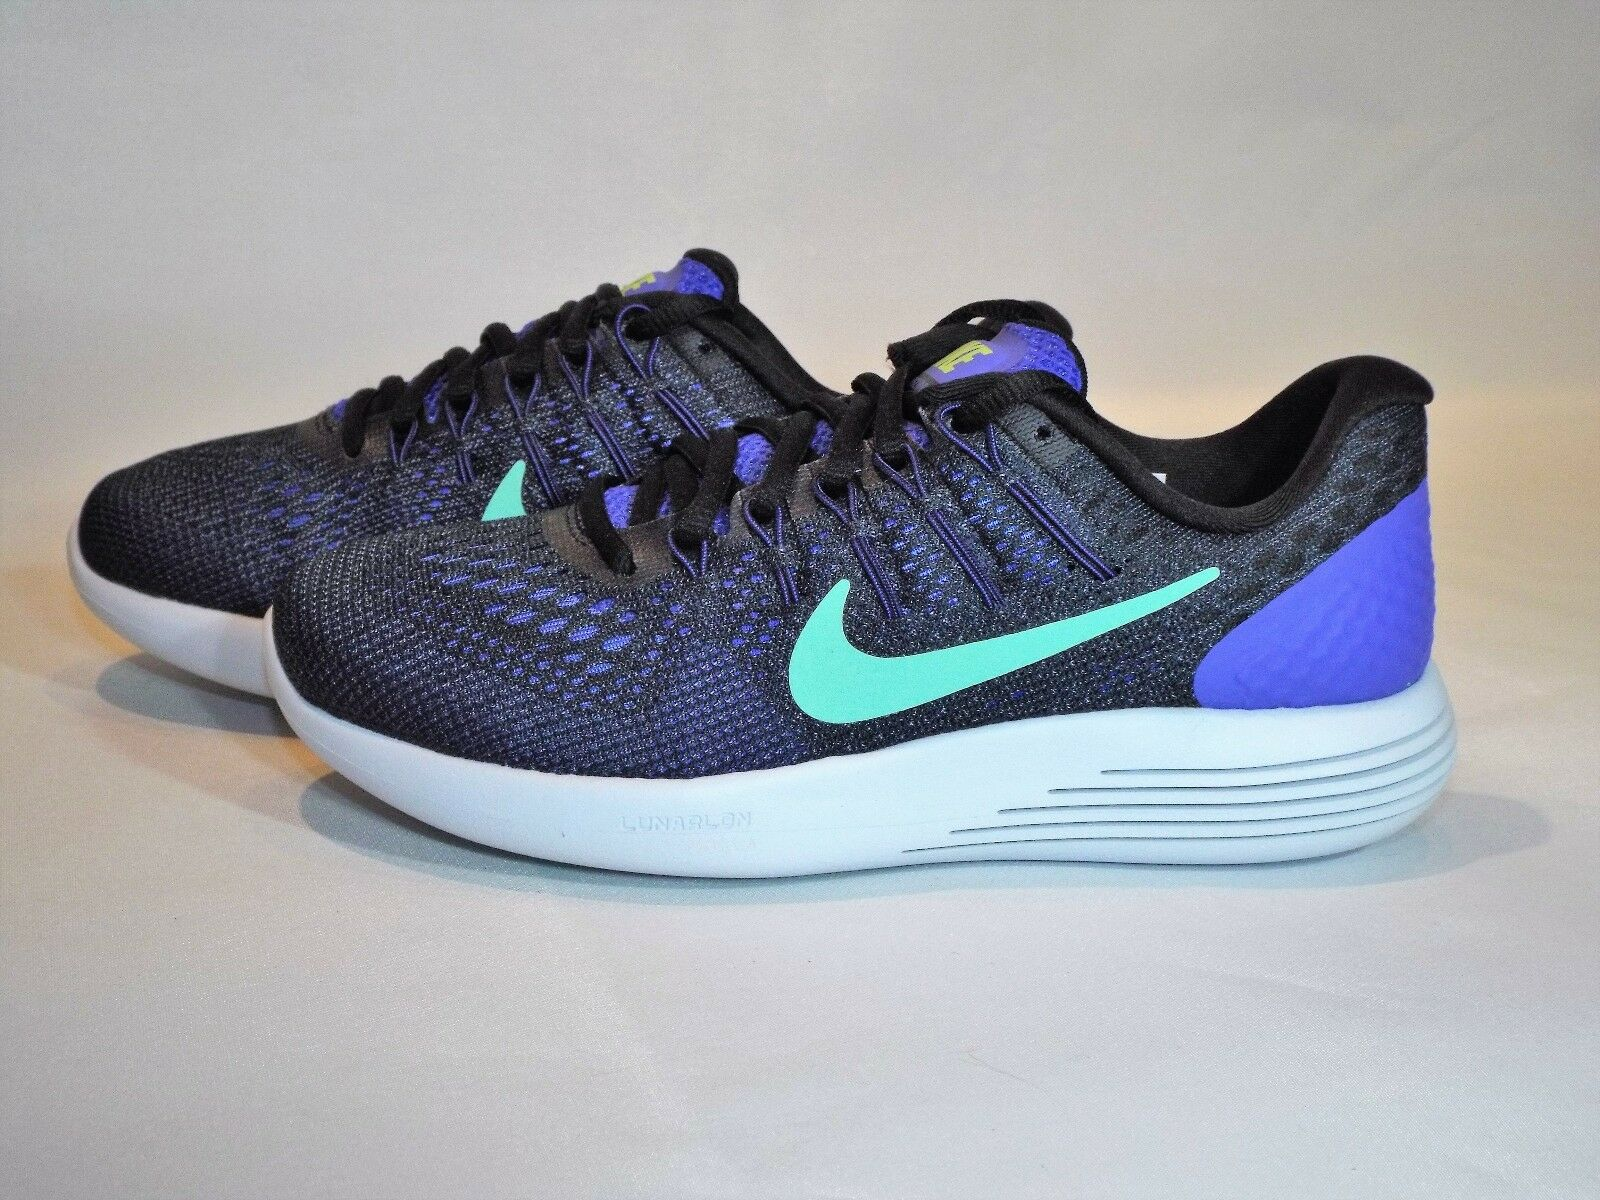 Women's Nike Lunarglide 8 Size 5 (843726 500) Black/Persian Violet/Green Glow